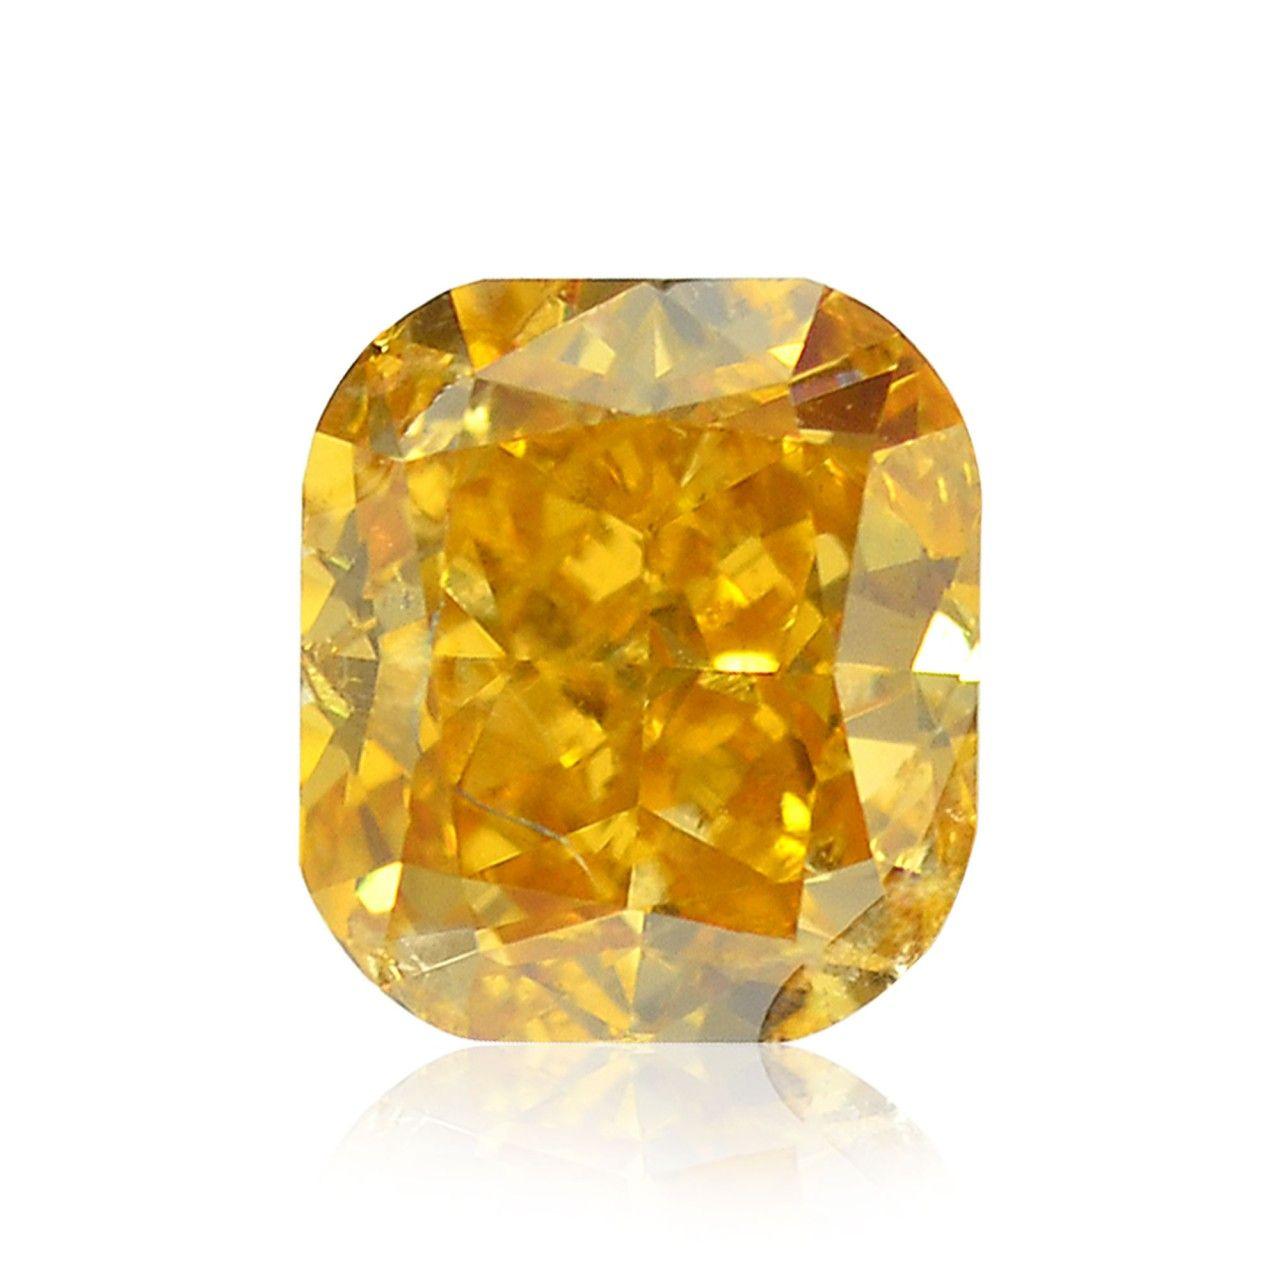 c66287abac Price: US $2,023.00 - .35 Carat - Vivid Orange Yellow - Loose Diamond  Natural Color: Radian - Cut: GIA - eaby